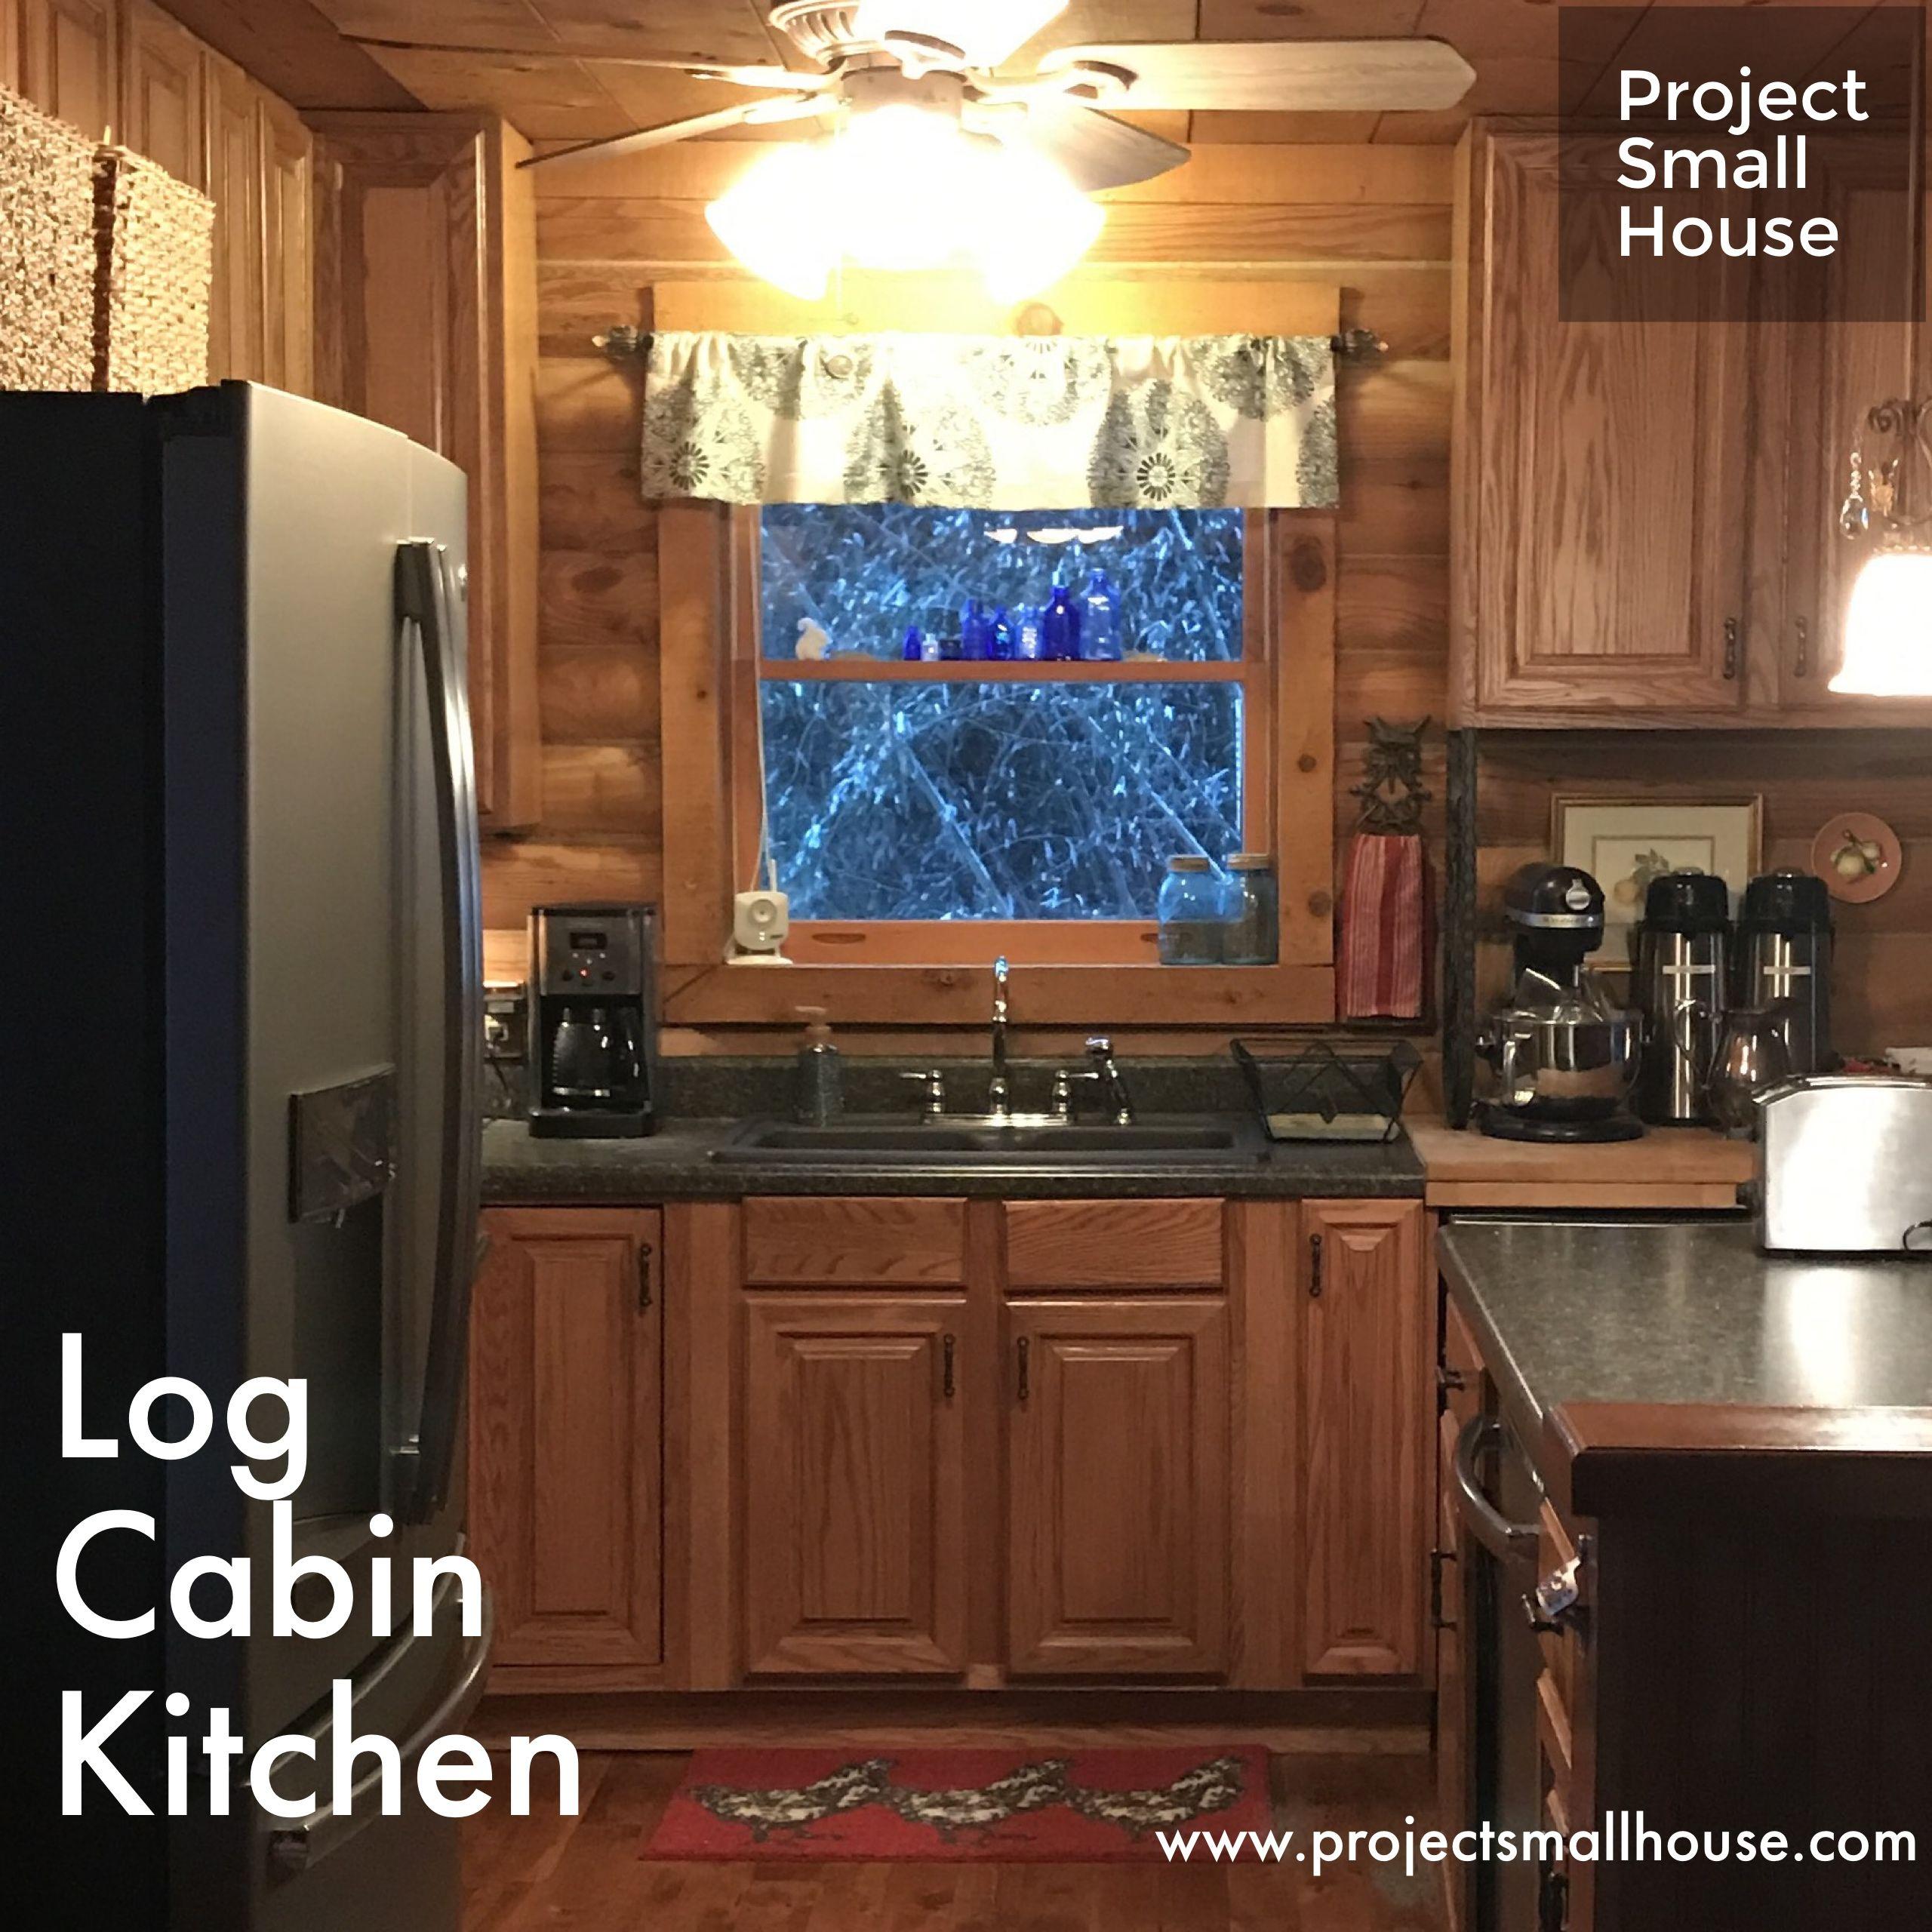 Project Log Cabin Kitchen Log Cabin Kitchens Cabin Kitchens Log Cabin Decor